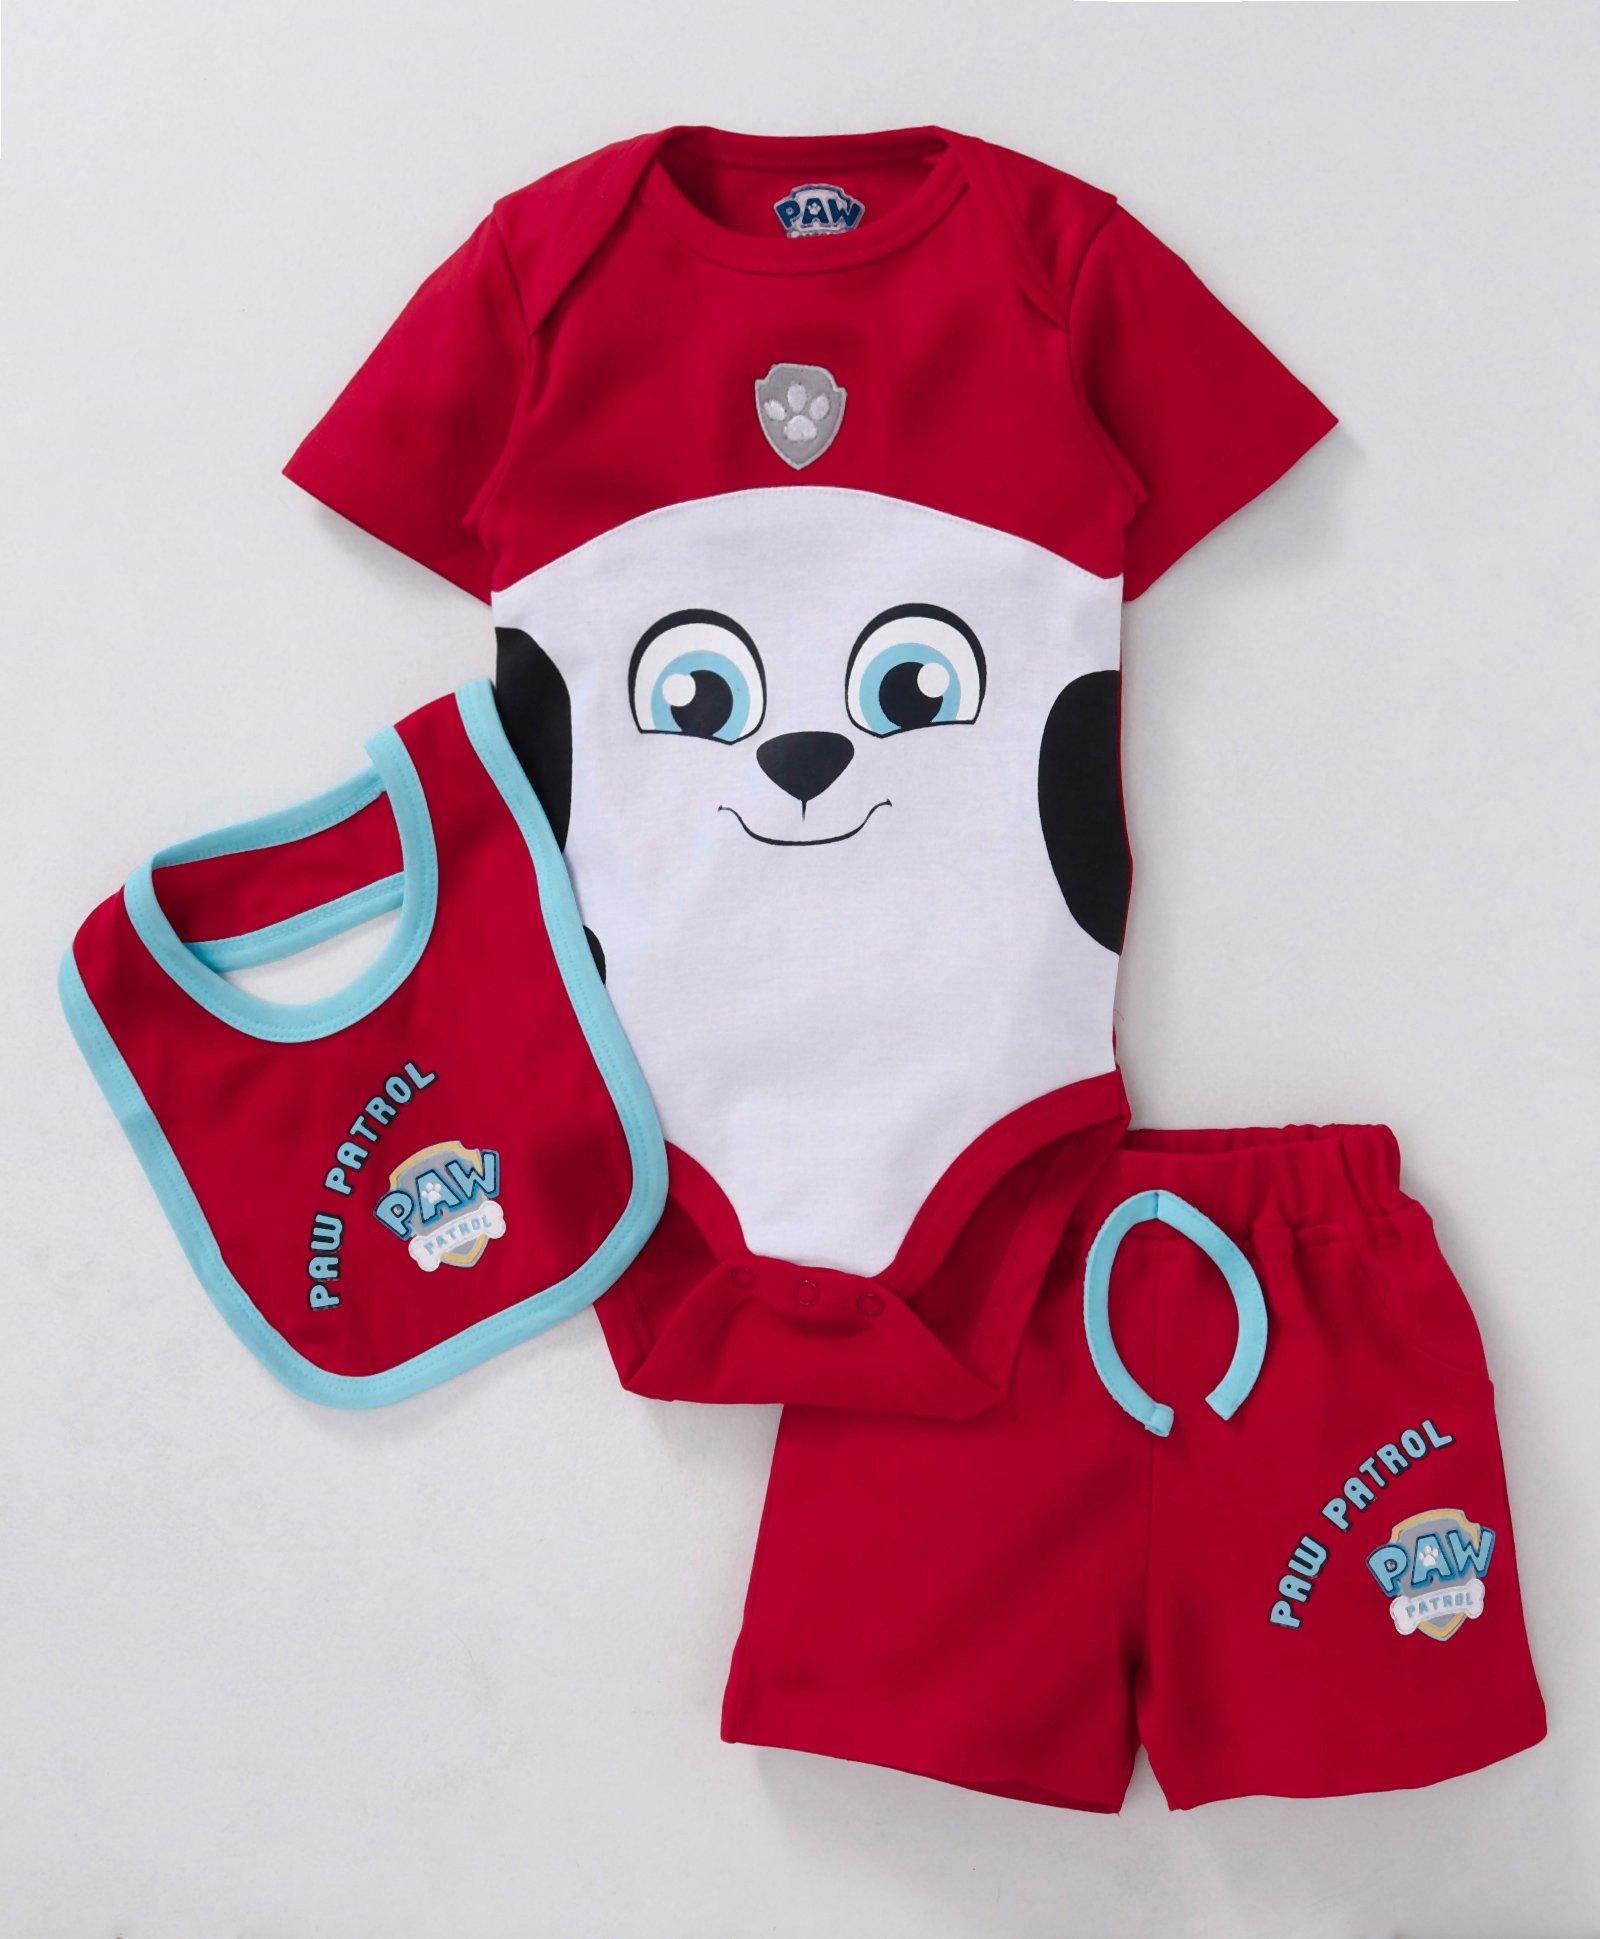 f8d83d4f2fdff Mom's Love Half Sleeves Onesie With Shorts & Bib Paw Patrol Print - Red